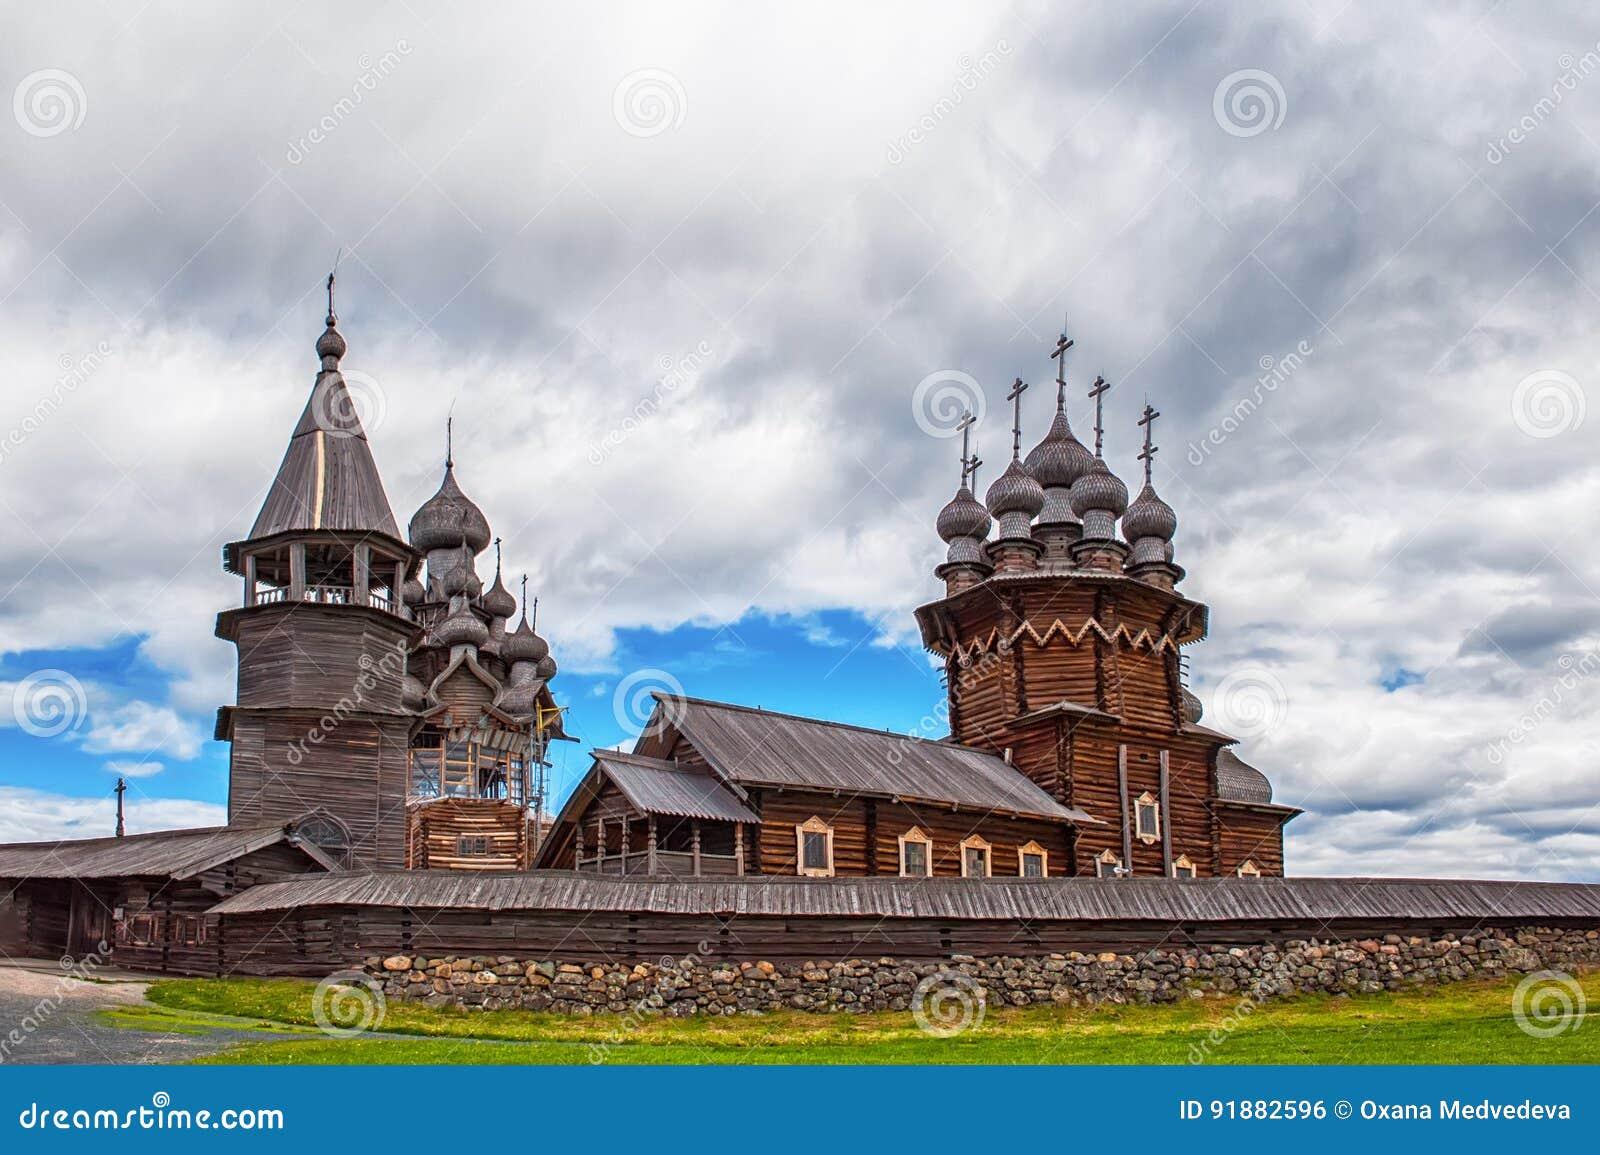 Wooden Orthodox Church of the Transfiguration on Kizhi island